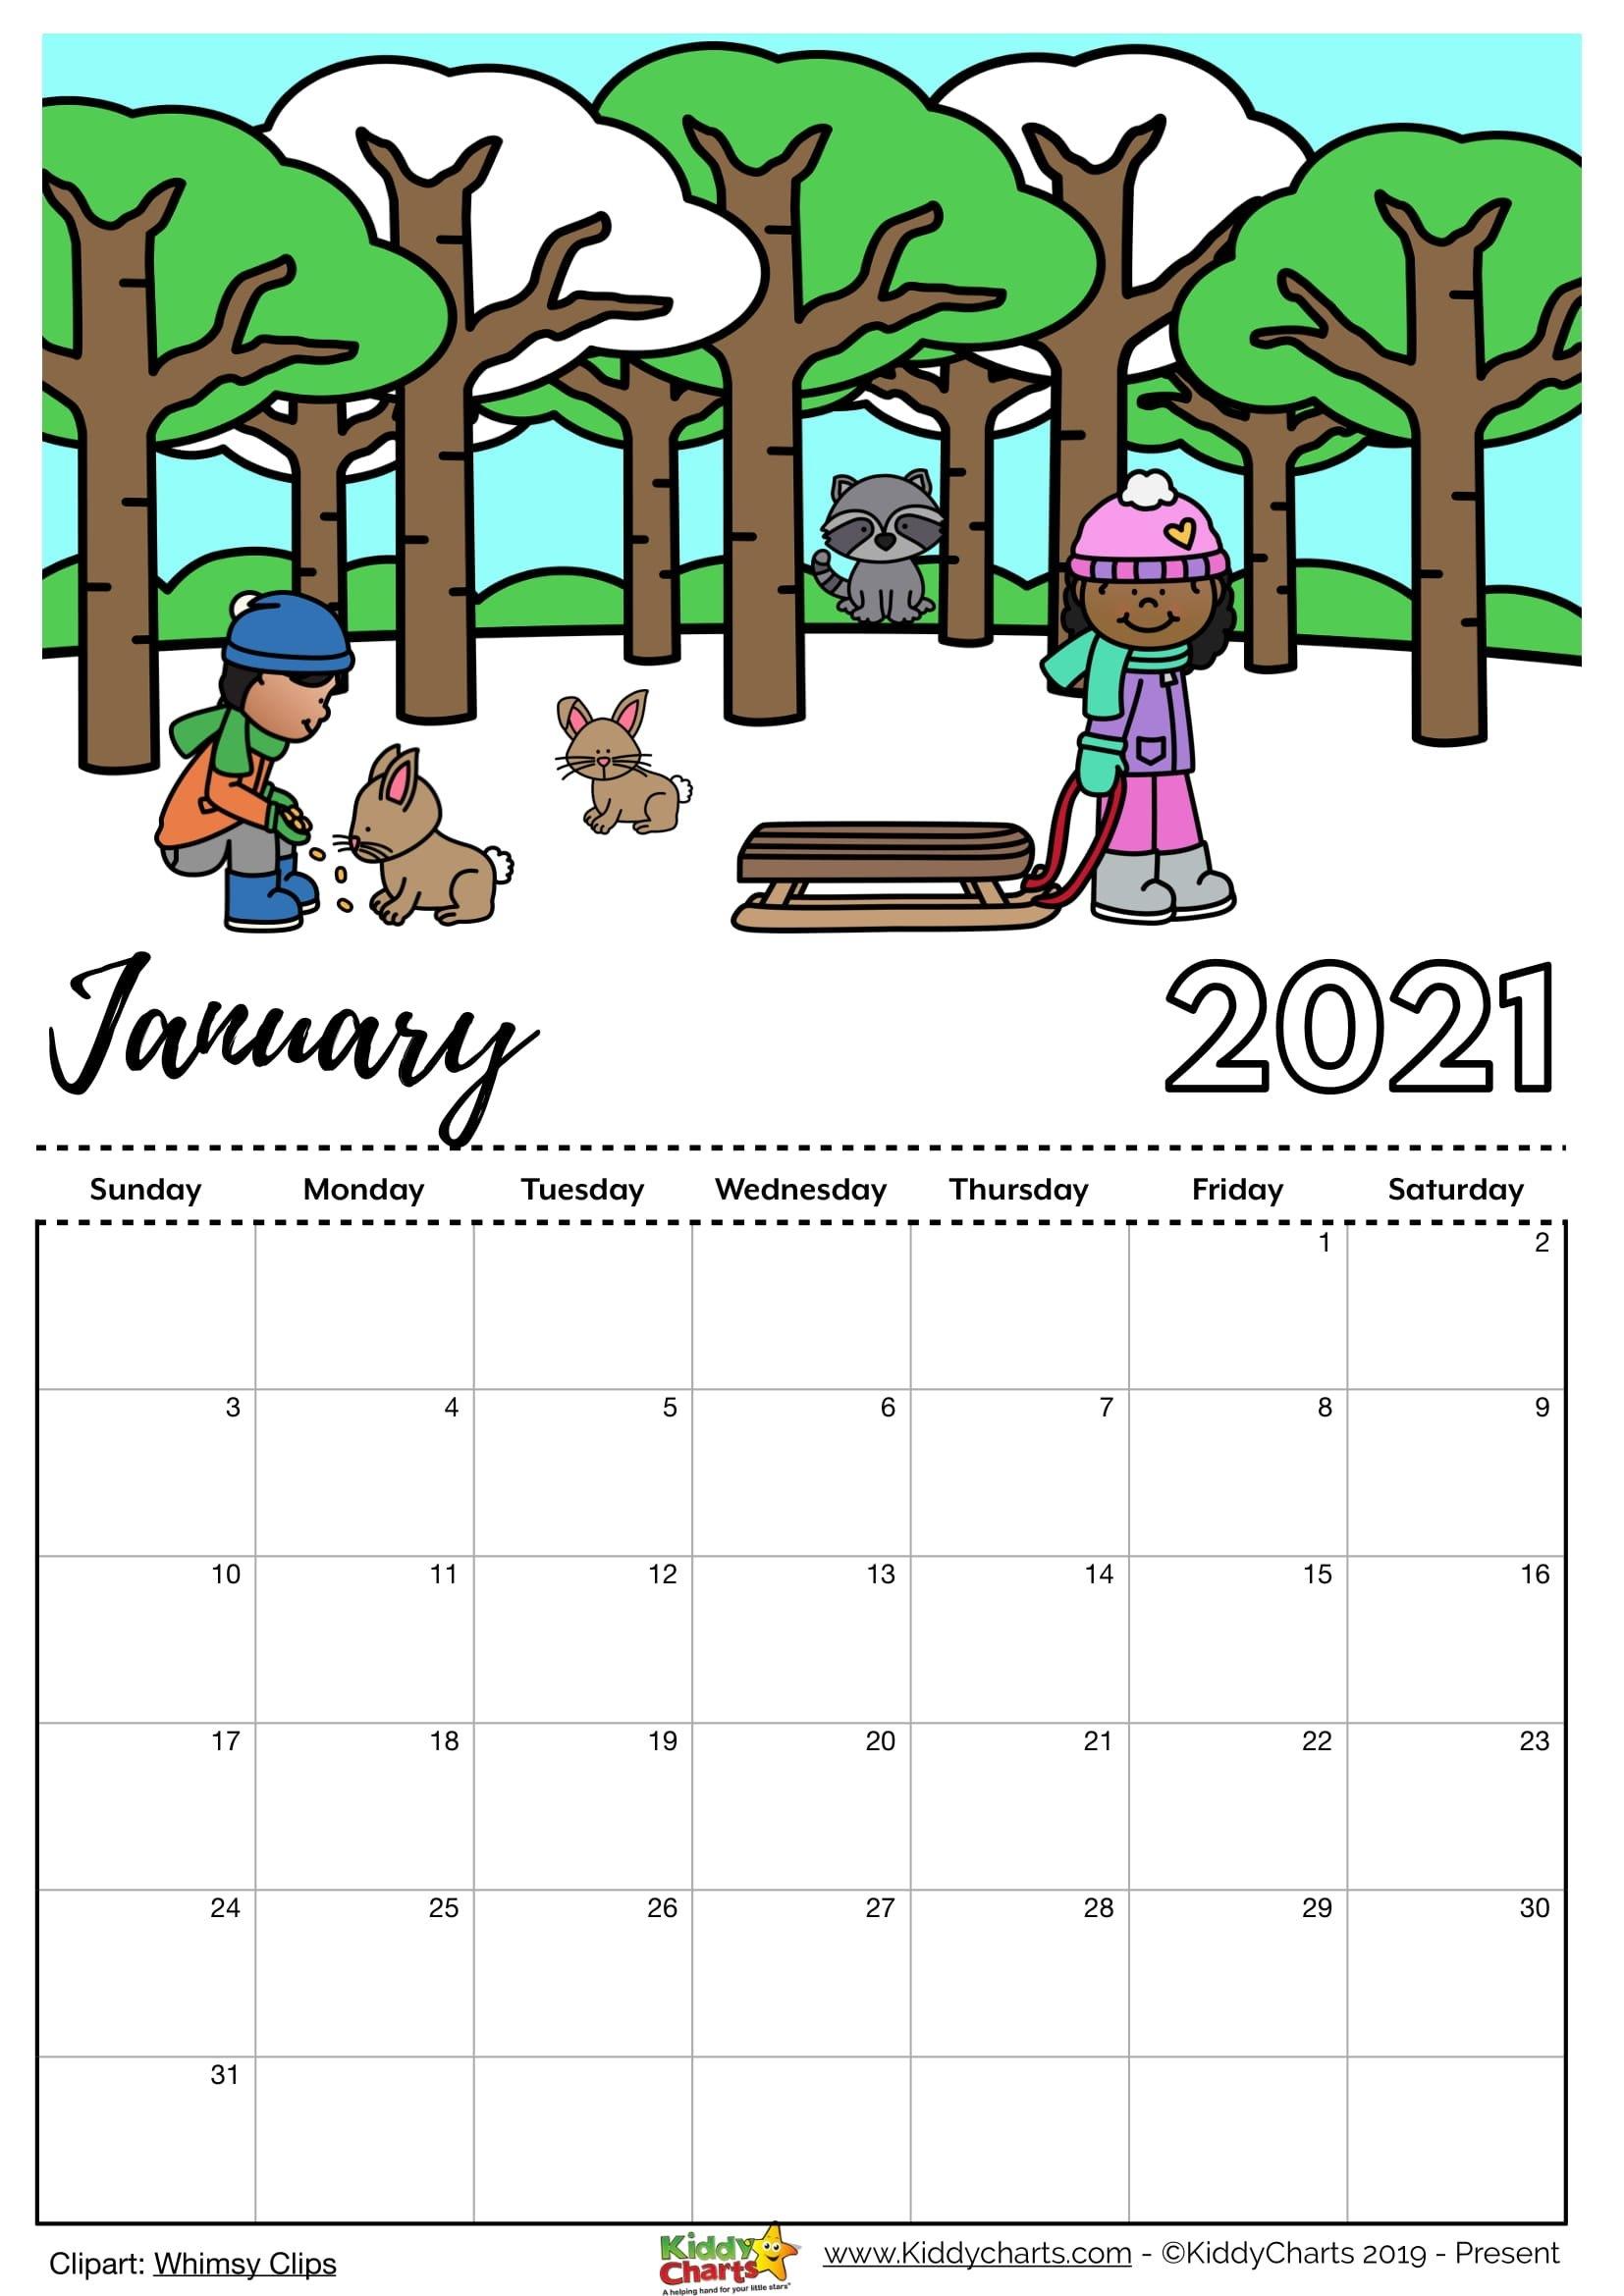 Free Editable Weekly 2021 Calendar - Free Printable 2021 Calendar: Includes Editable Version in 2021 Weekly Calendars Printable Free